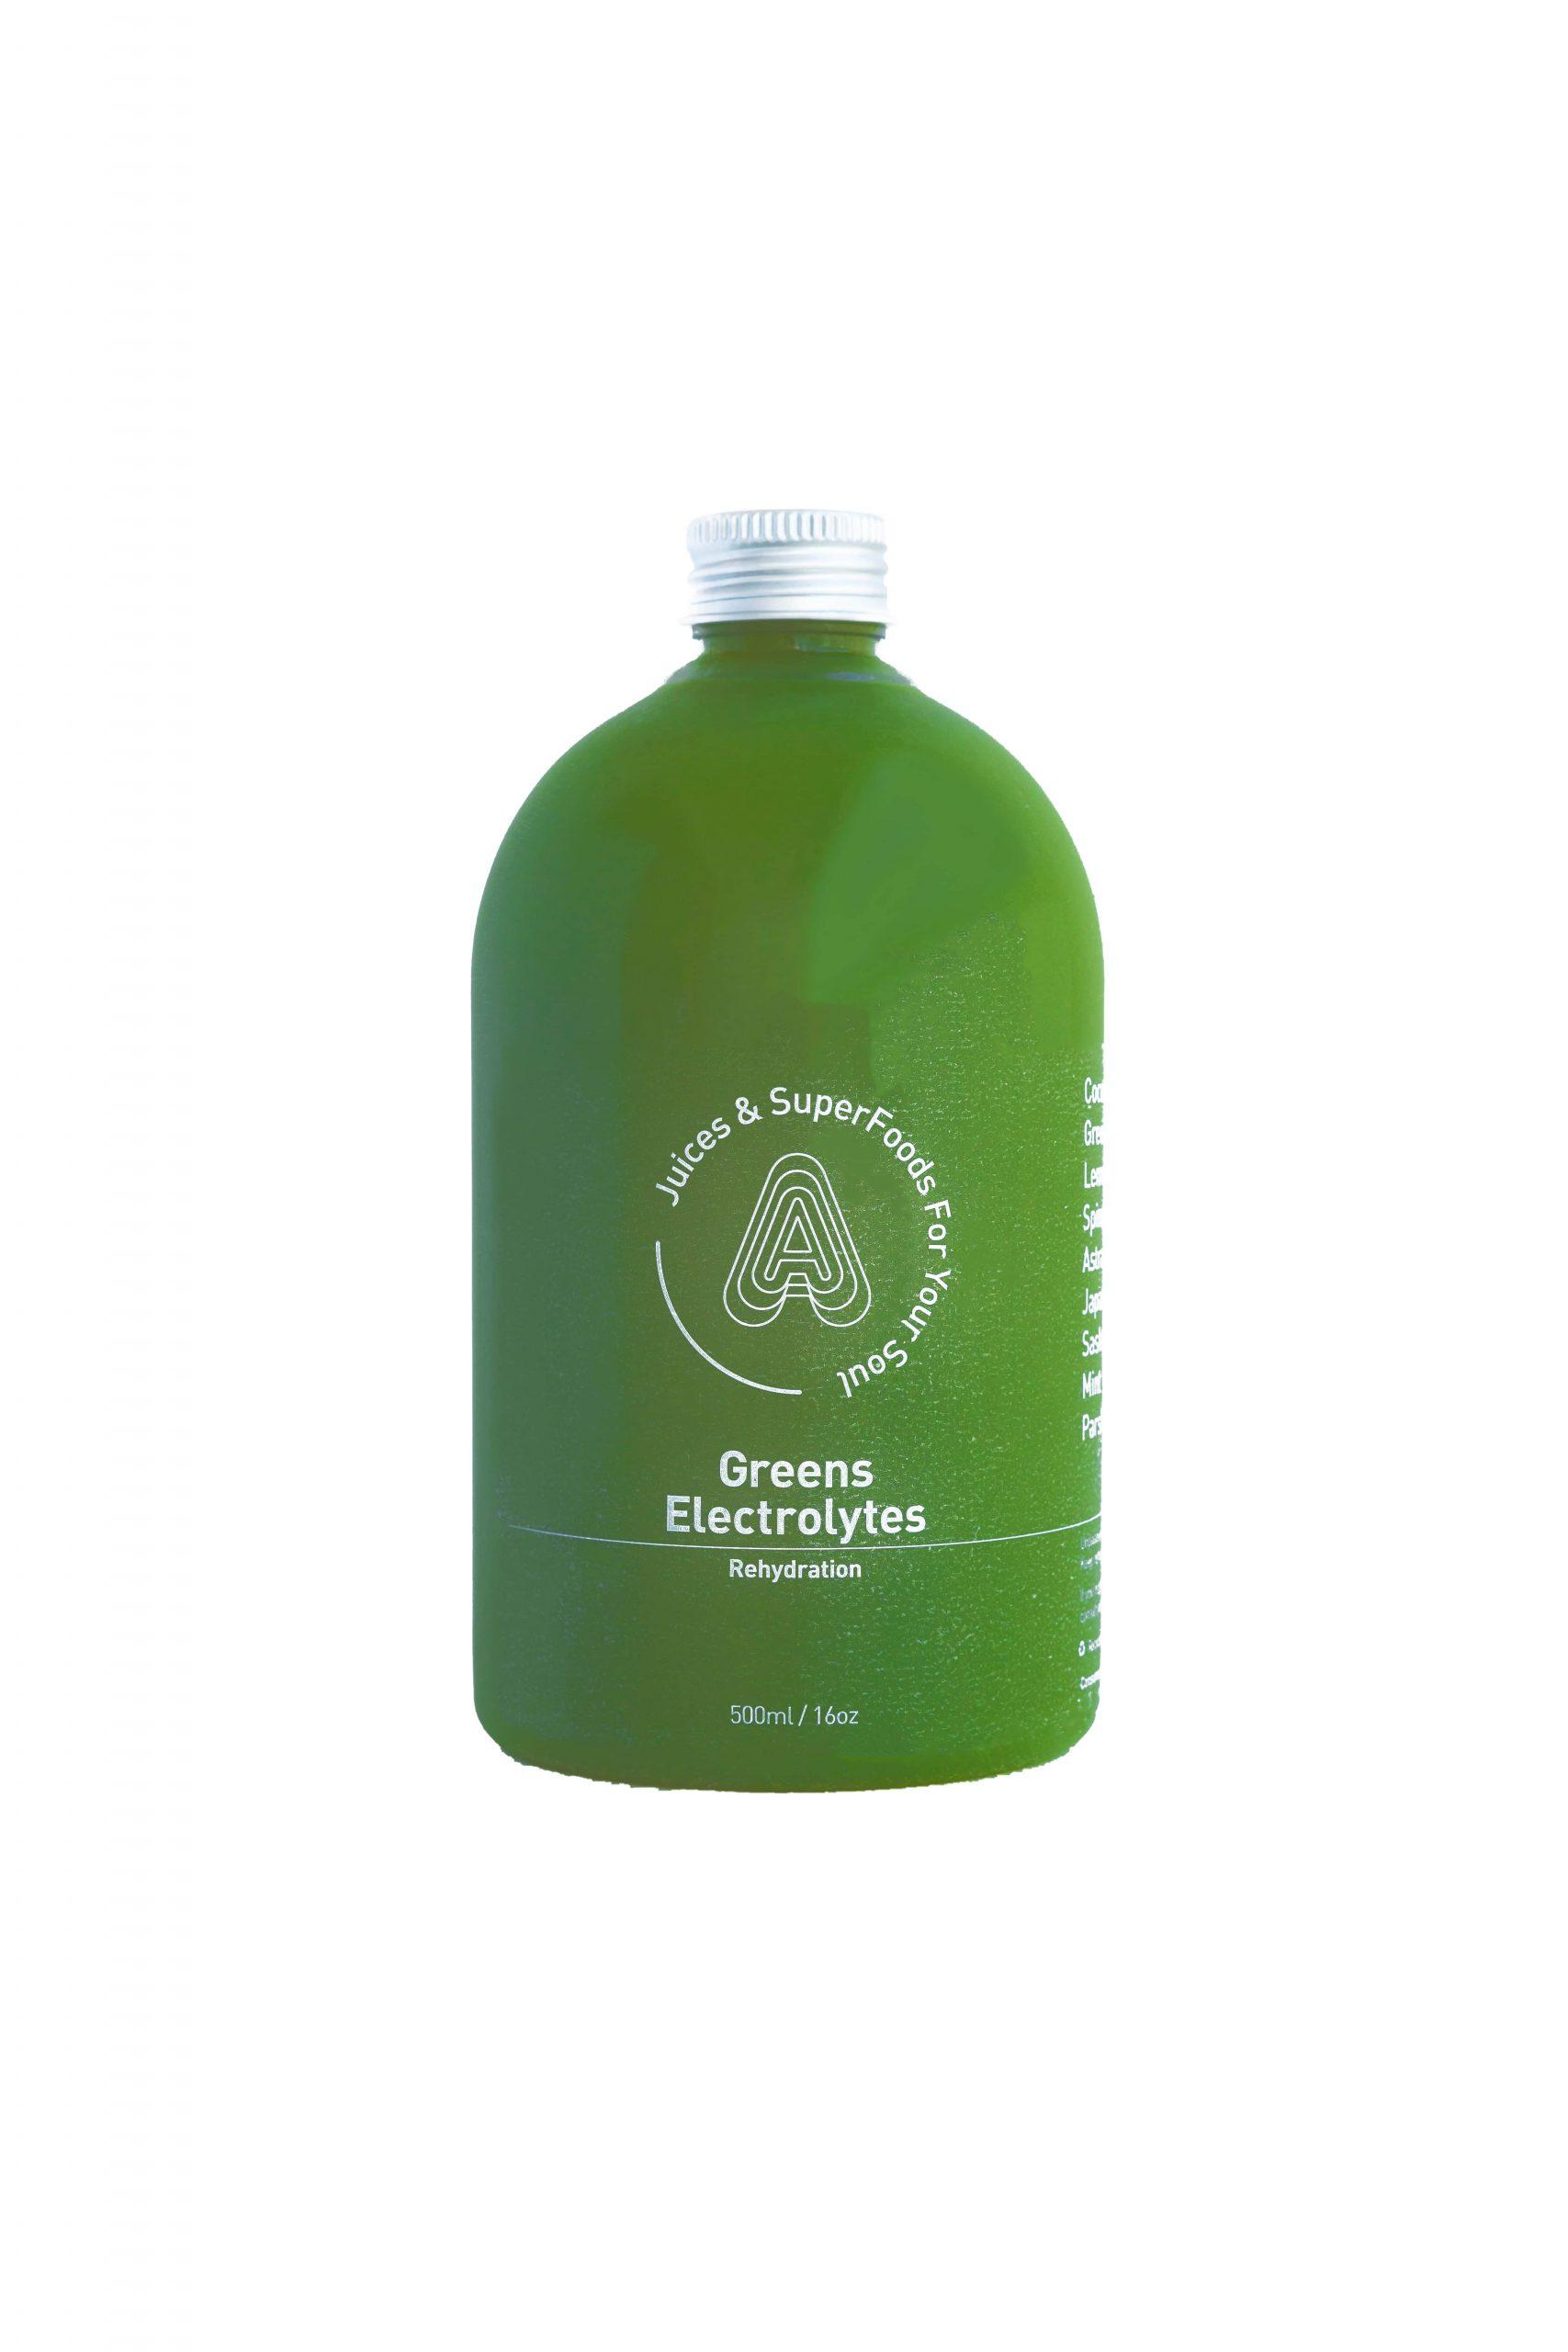 Green Electrolytes